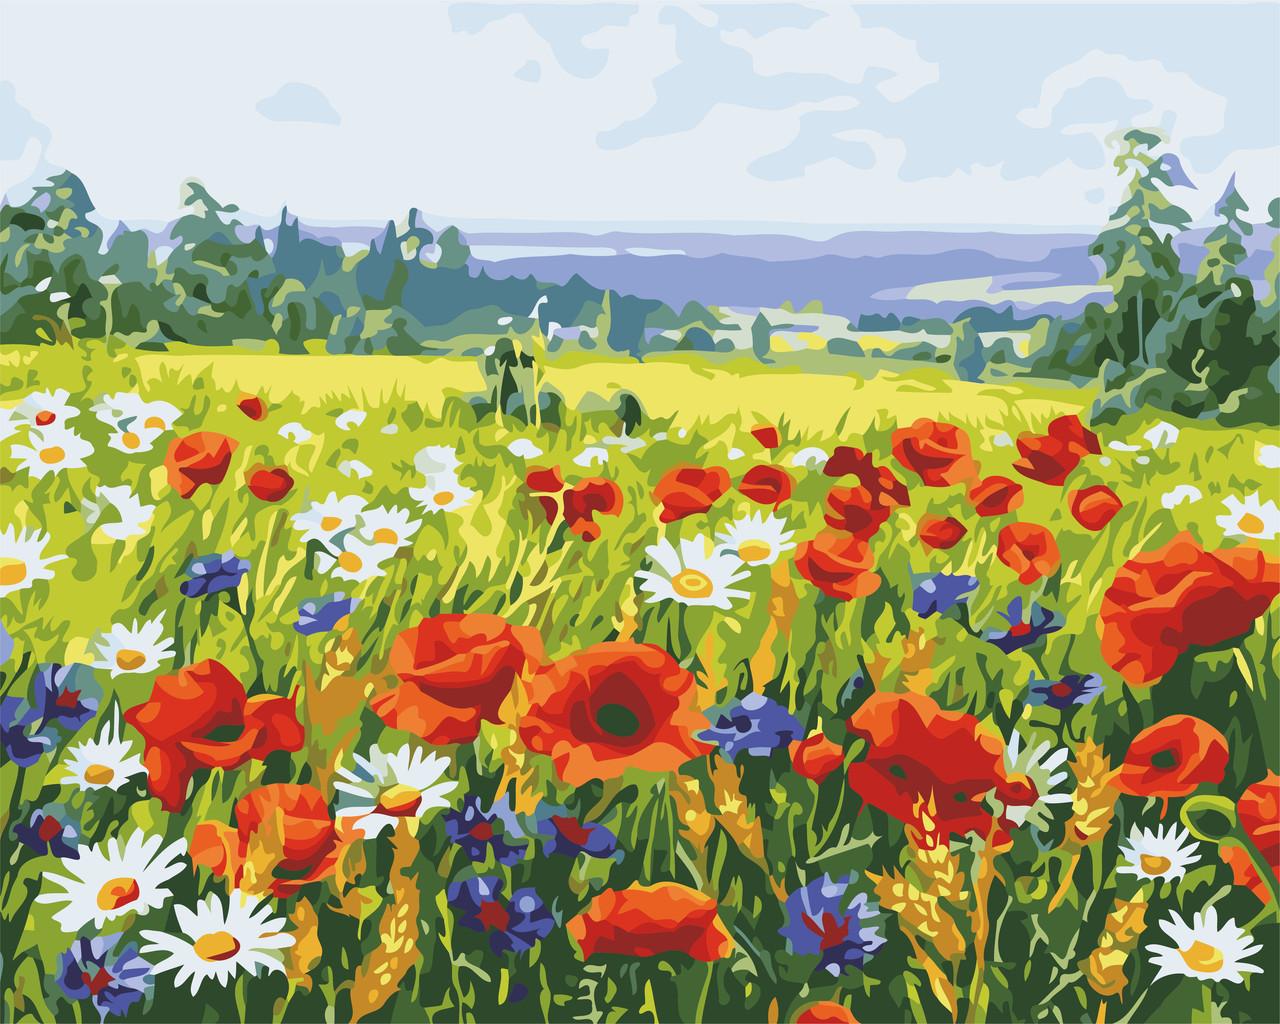 Картина по номерам Поле цветов ArtStory AS0546 40 х 50 см